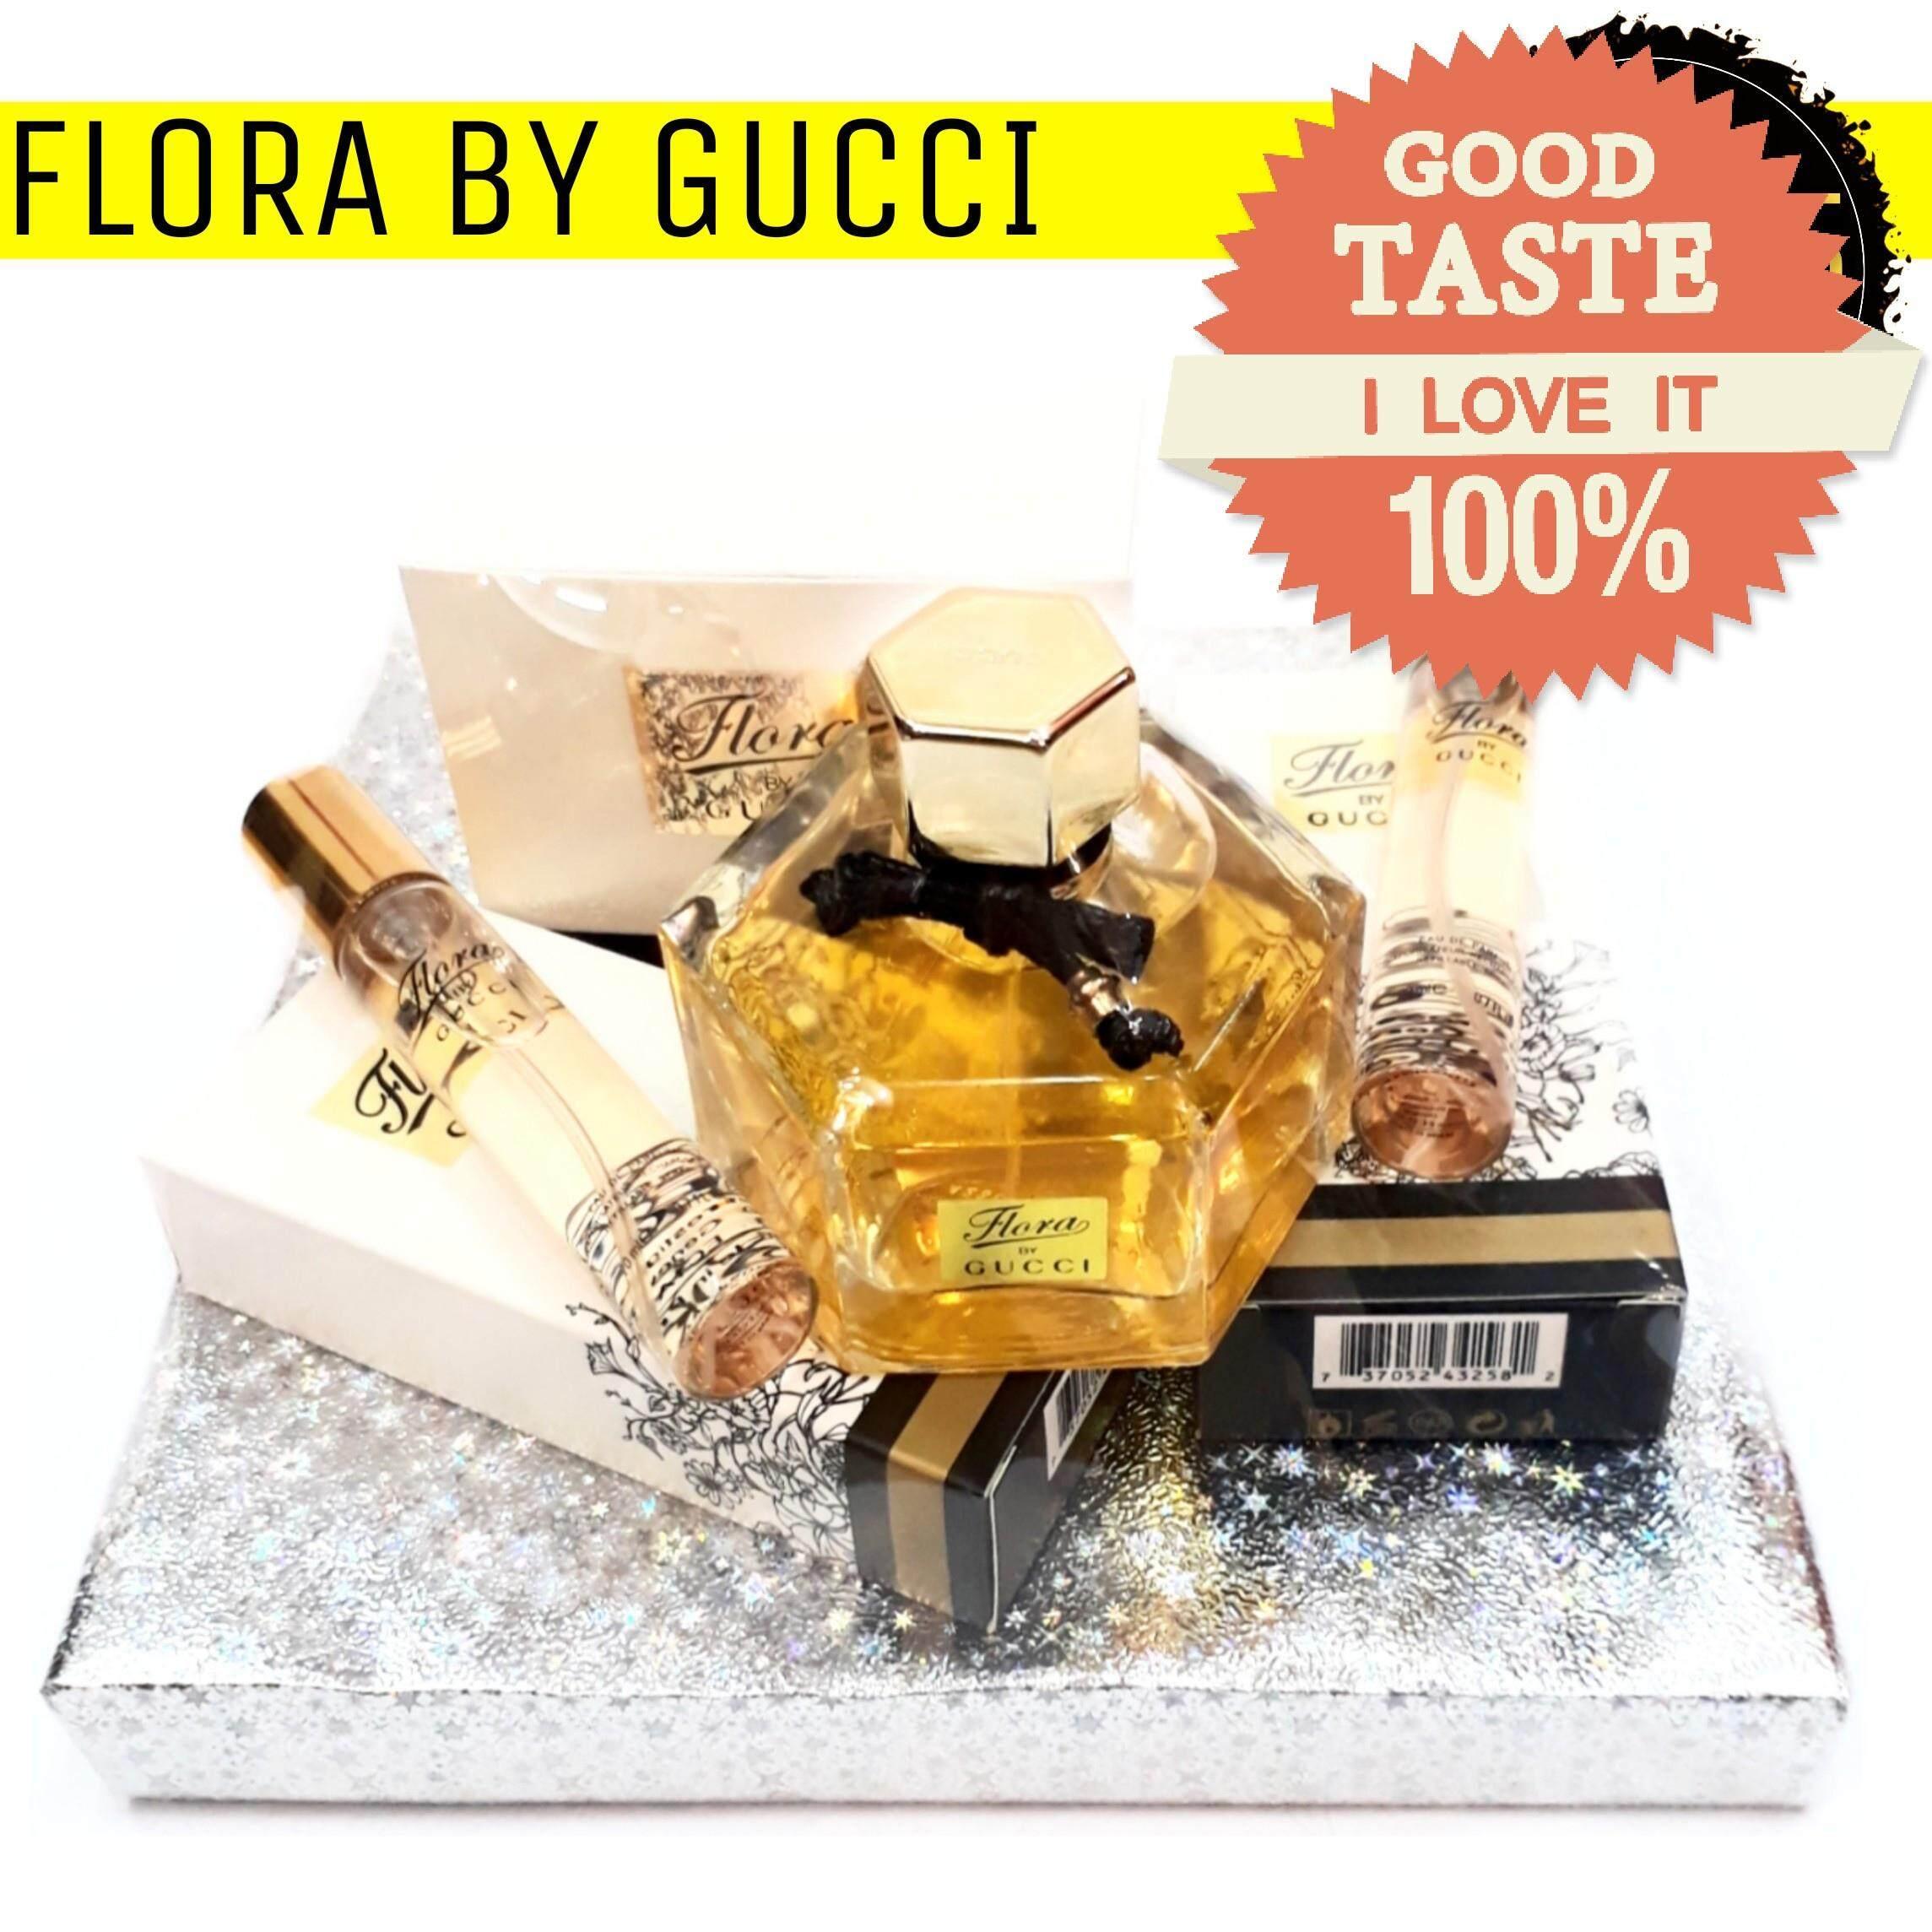 Gucci Flora Perfume Gift Set